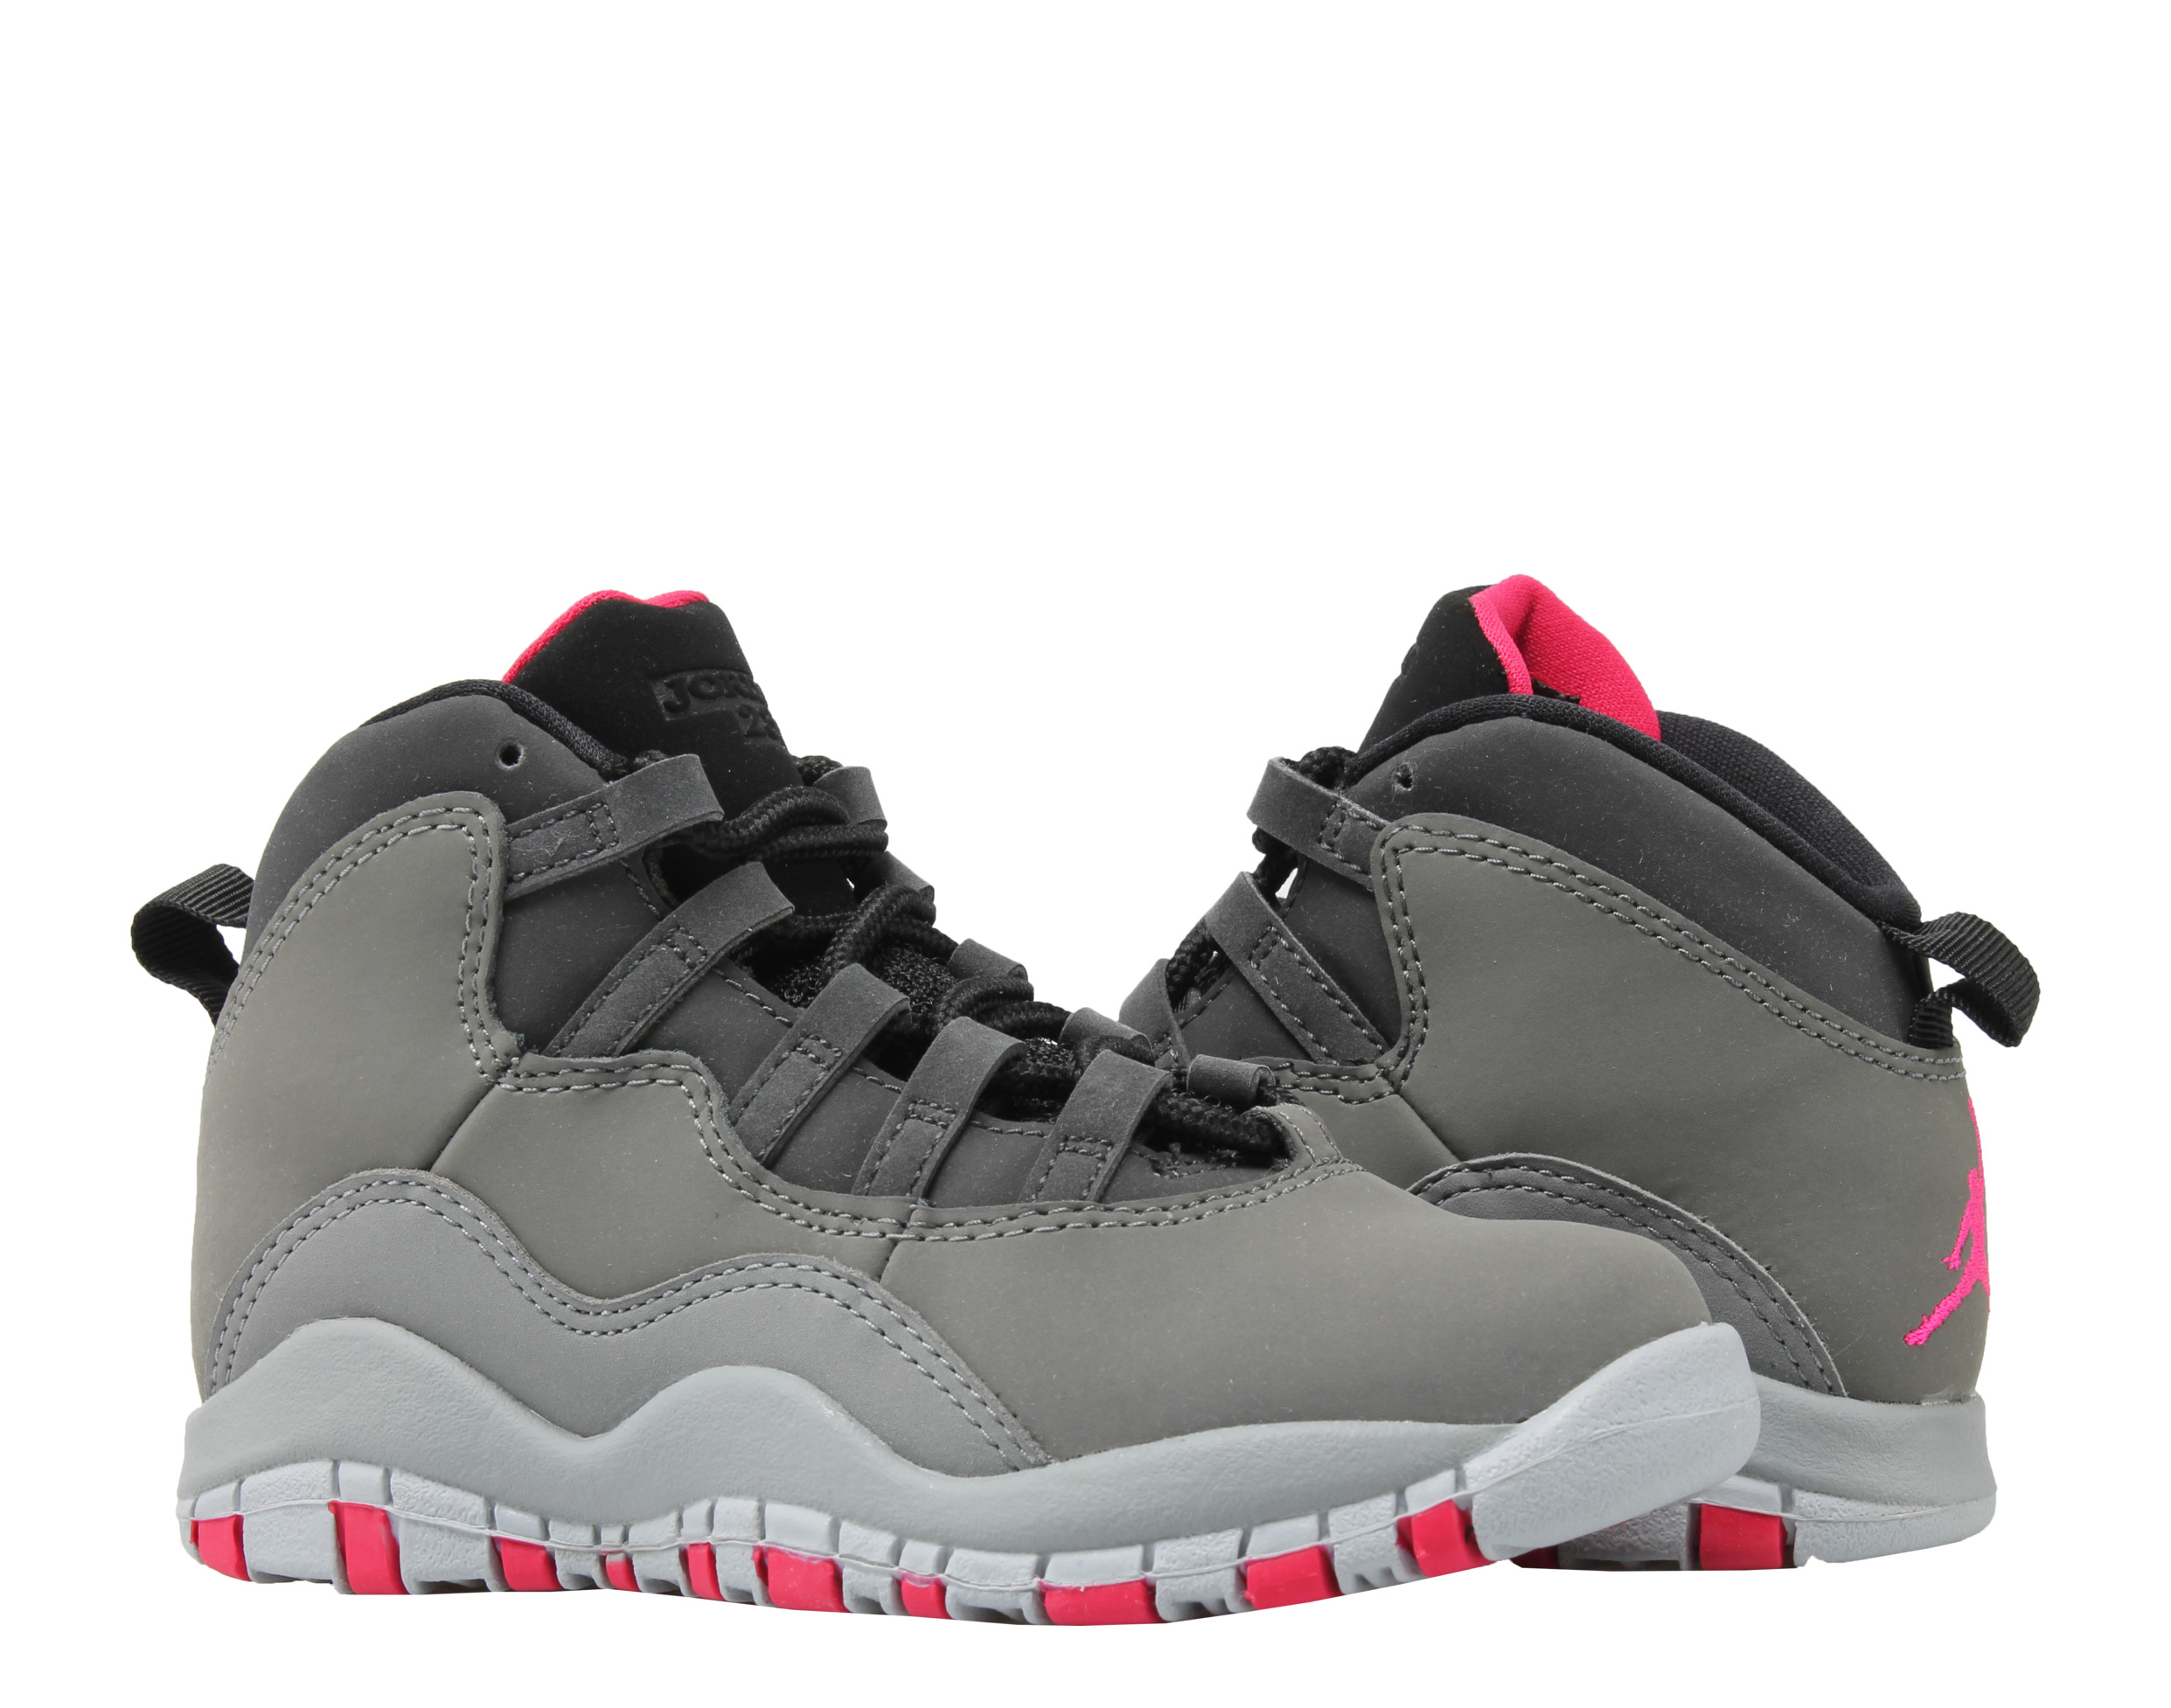 f4a5147eebdc3d ... new zealand product image nike air jordan 10 retro ps dark shadow grey  little kids shoes